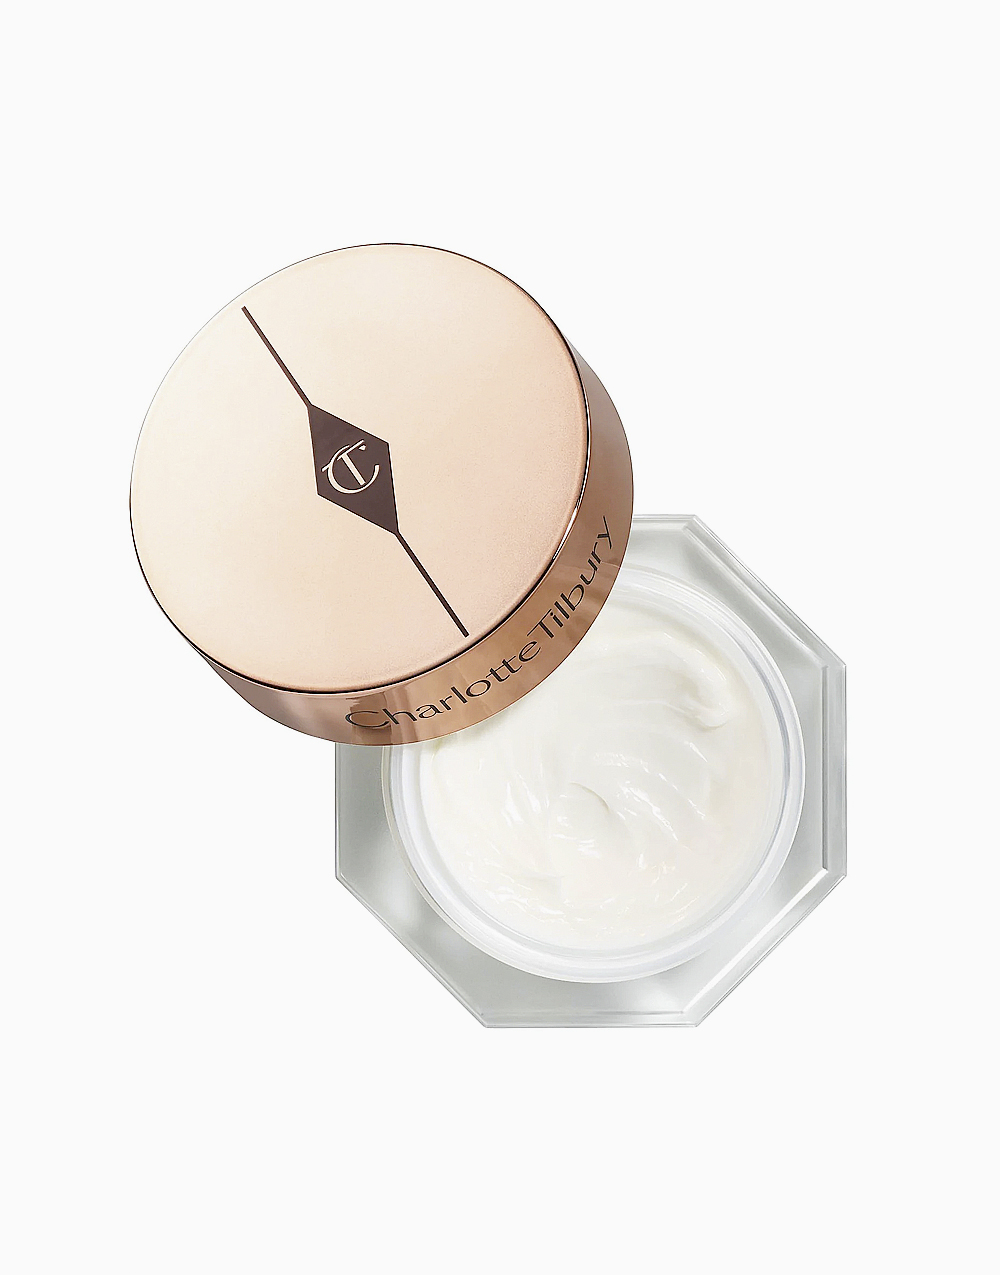 Magic Cream Moisturizer (50ml) by Charlotte Tilbury